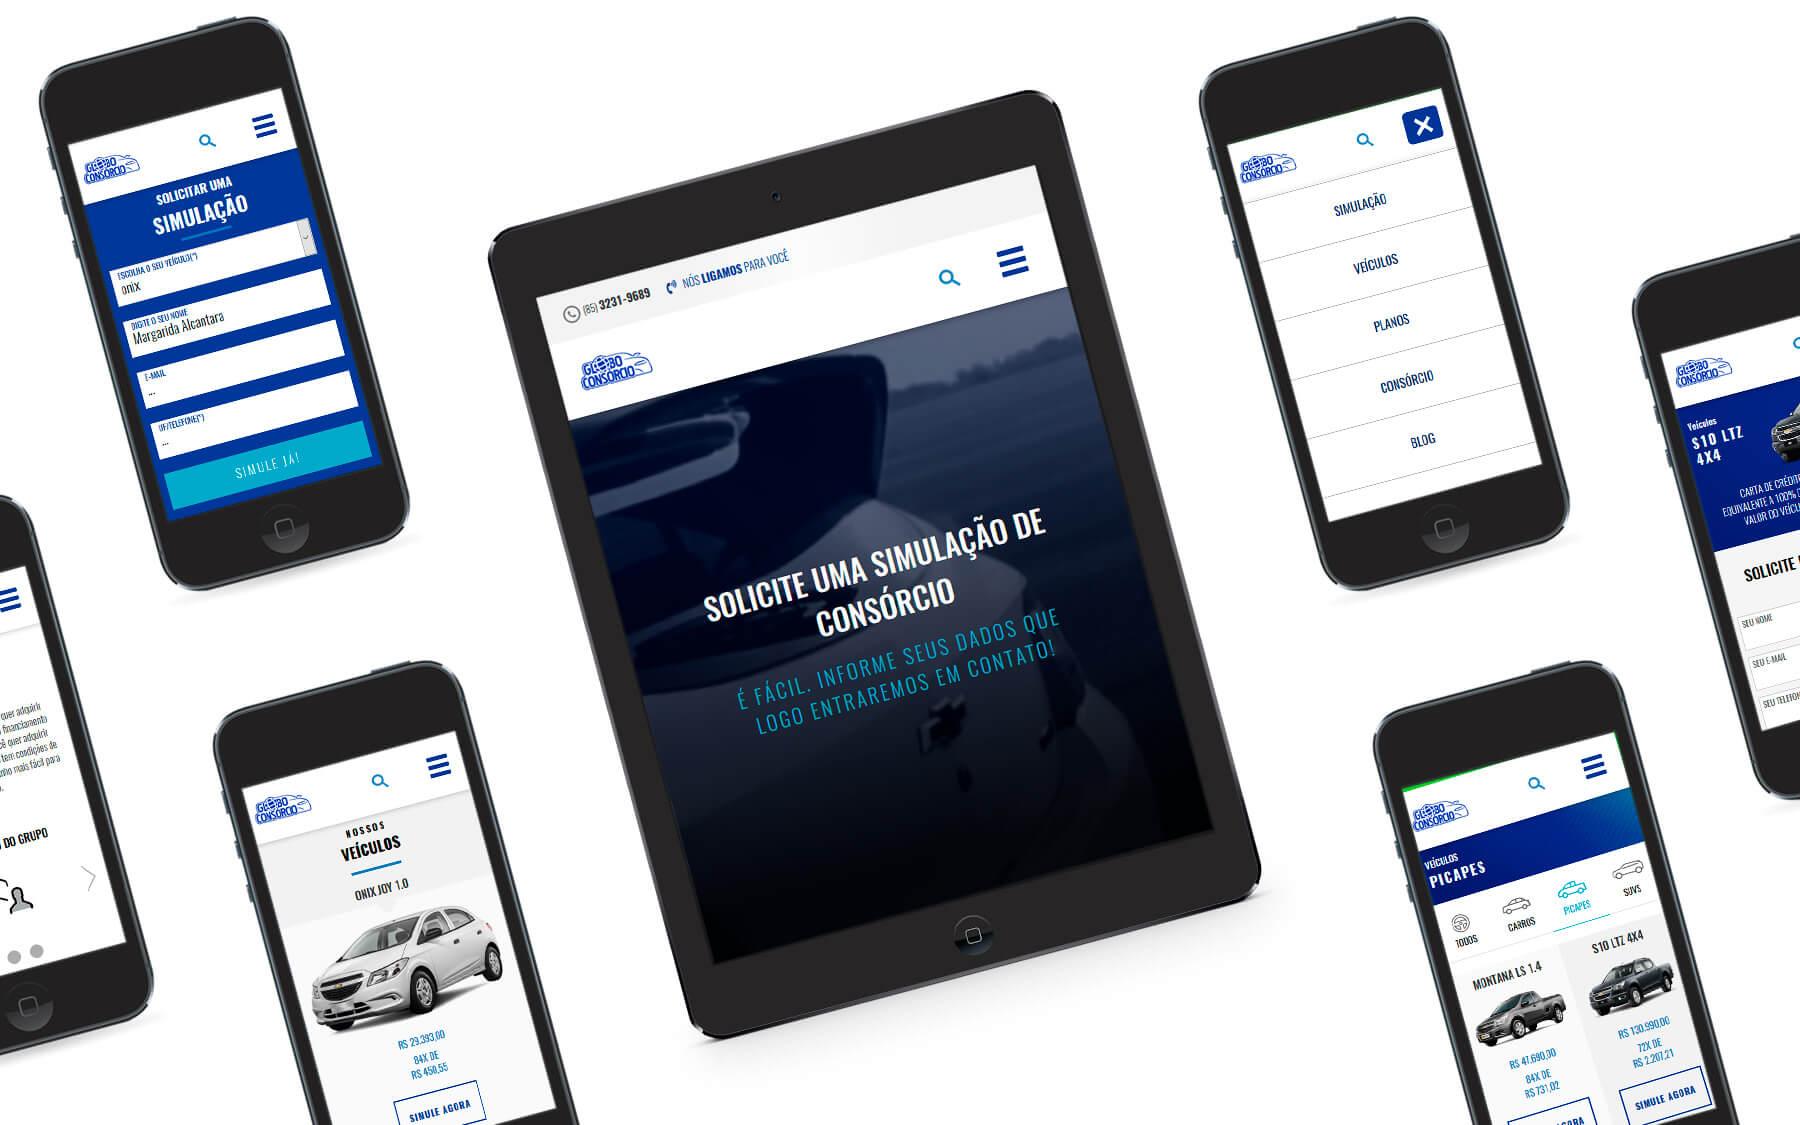 Portfólio: E-commerce Mobile Globo Consórcio - Consórcio Chevrolet - I9ME Web & Design